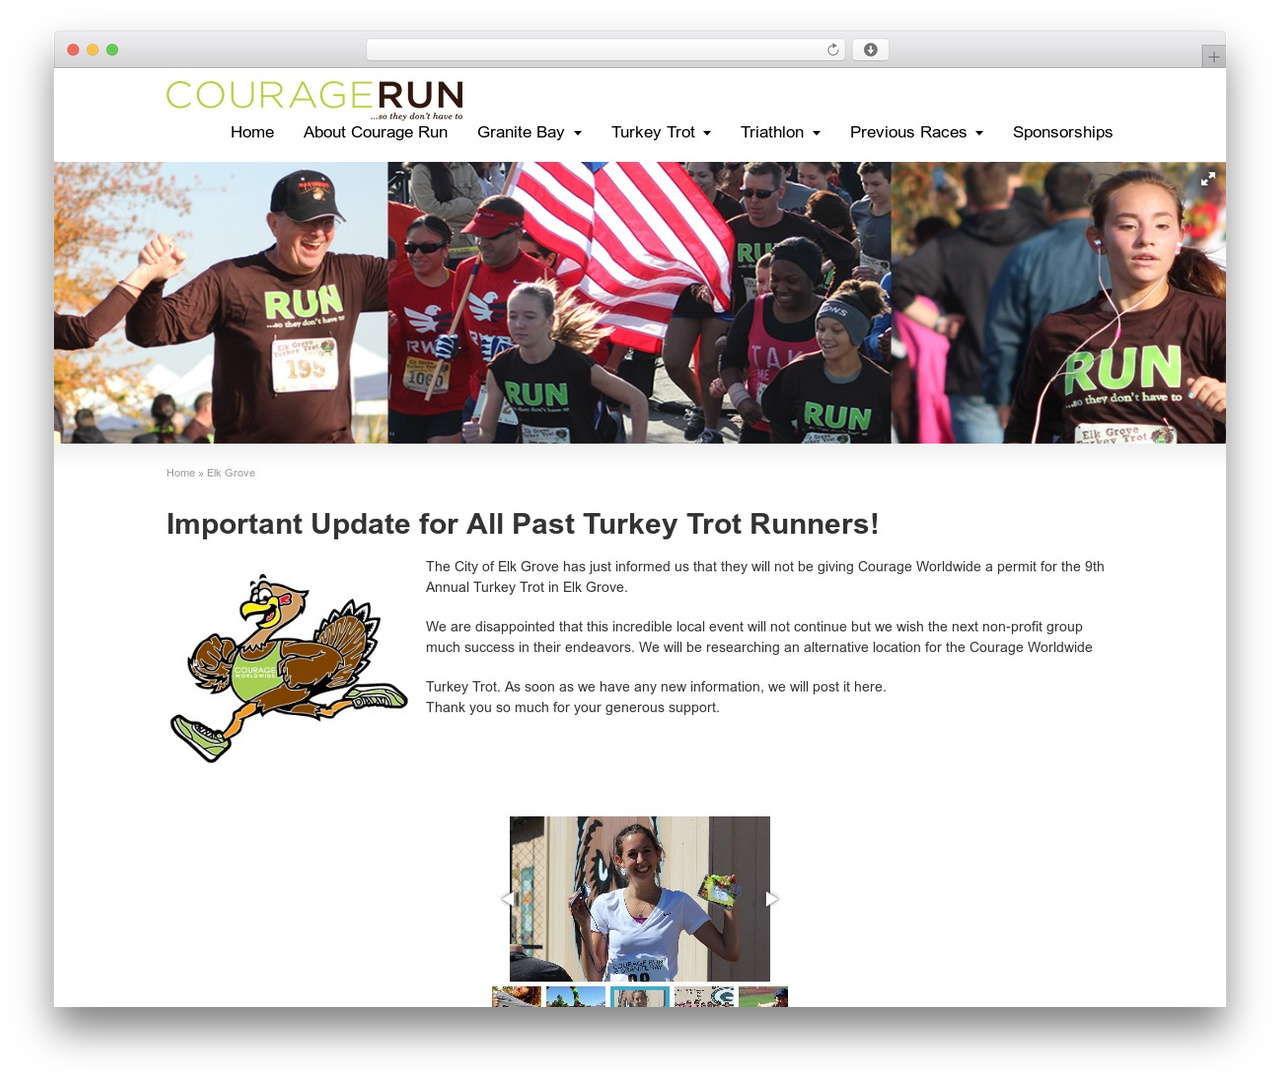 Striking MultiFlex & Ecommerce Responsive WordPress Theme template WordPress - courageworldwide.org/couragerun/elk-grove-turkey-trot